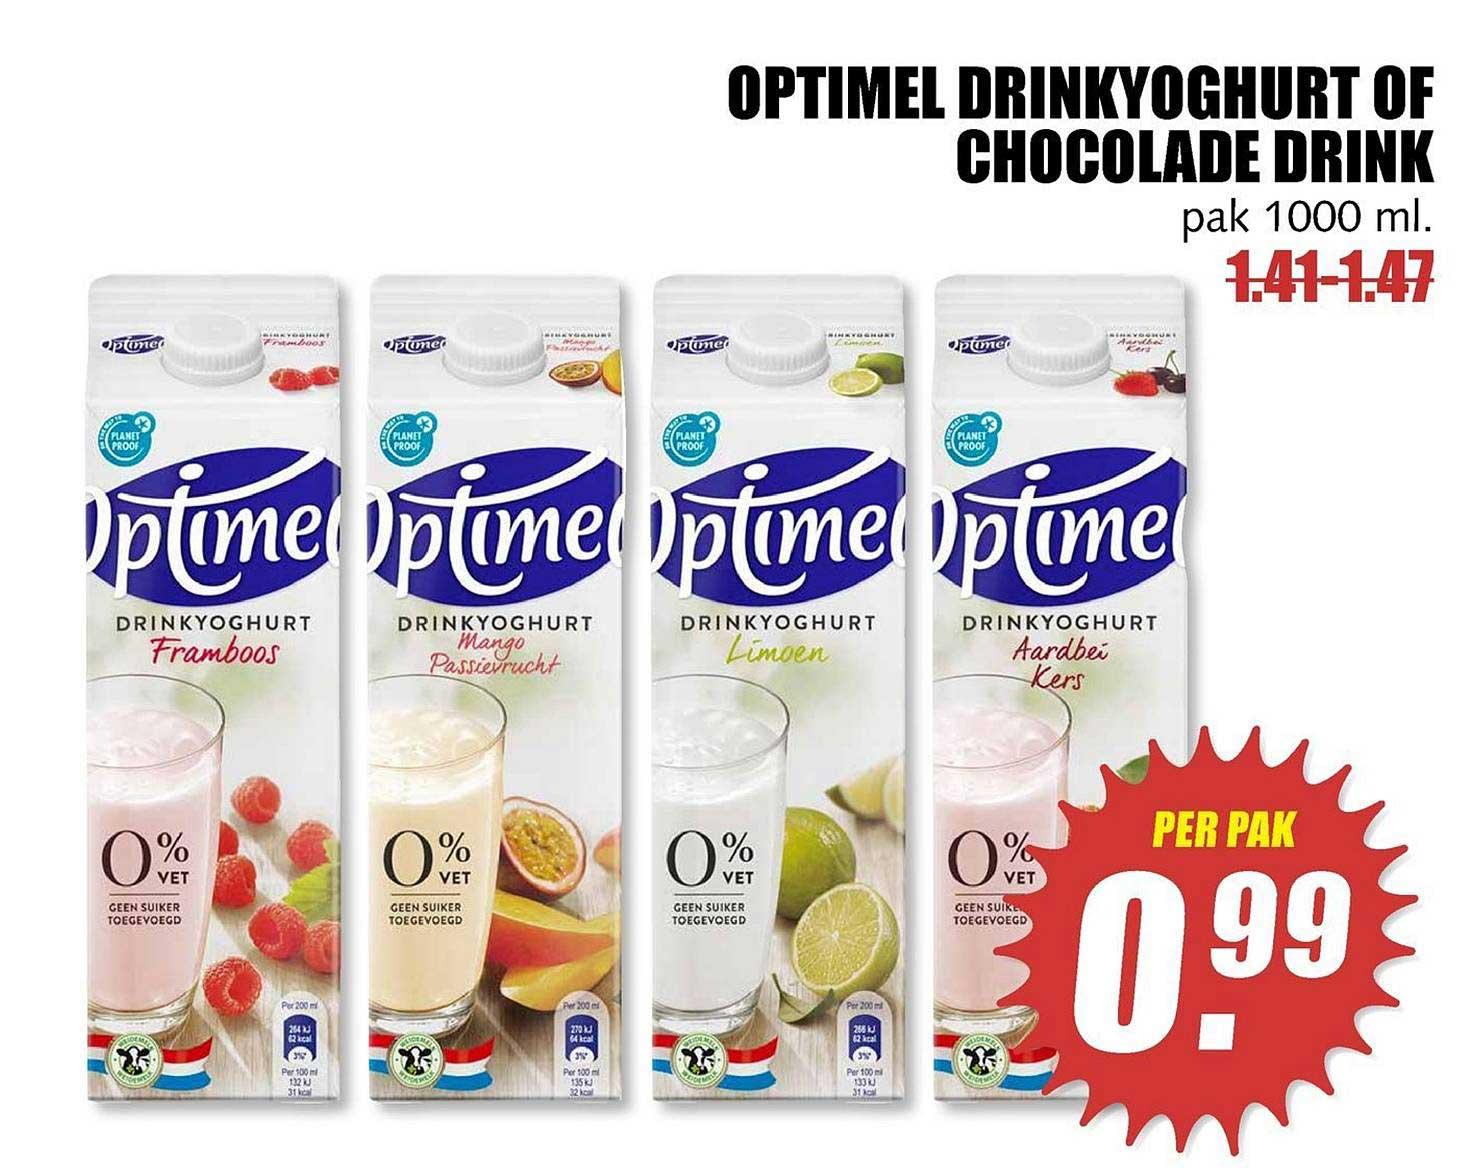 MCD Supermarkt Optimel Drinkyoghurt Of Chocolade Drink